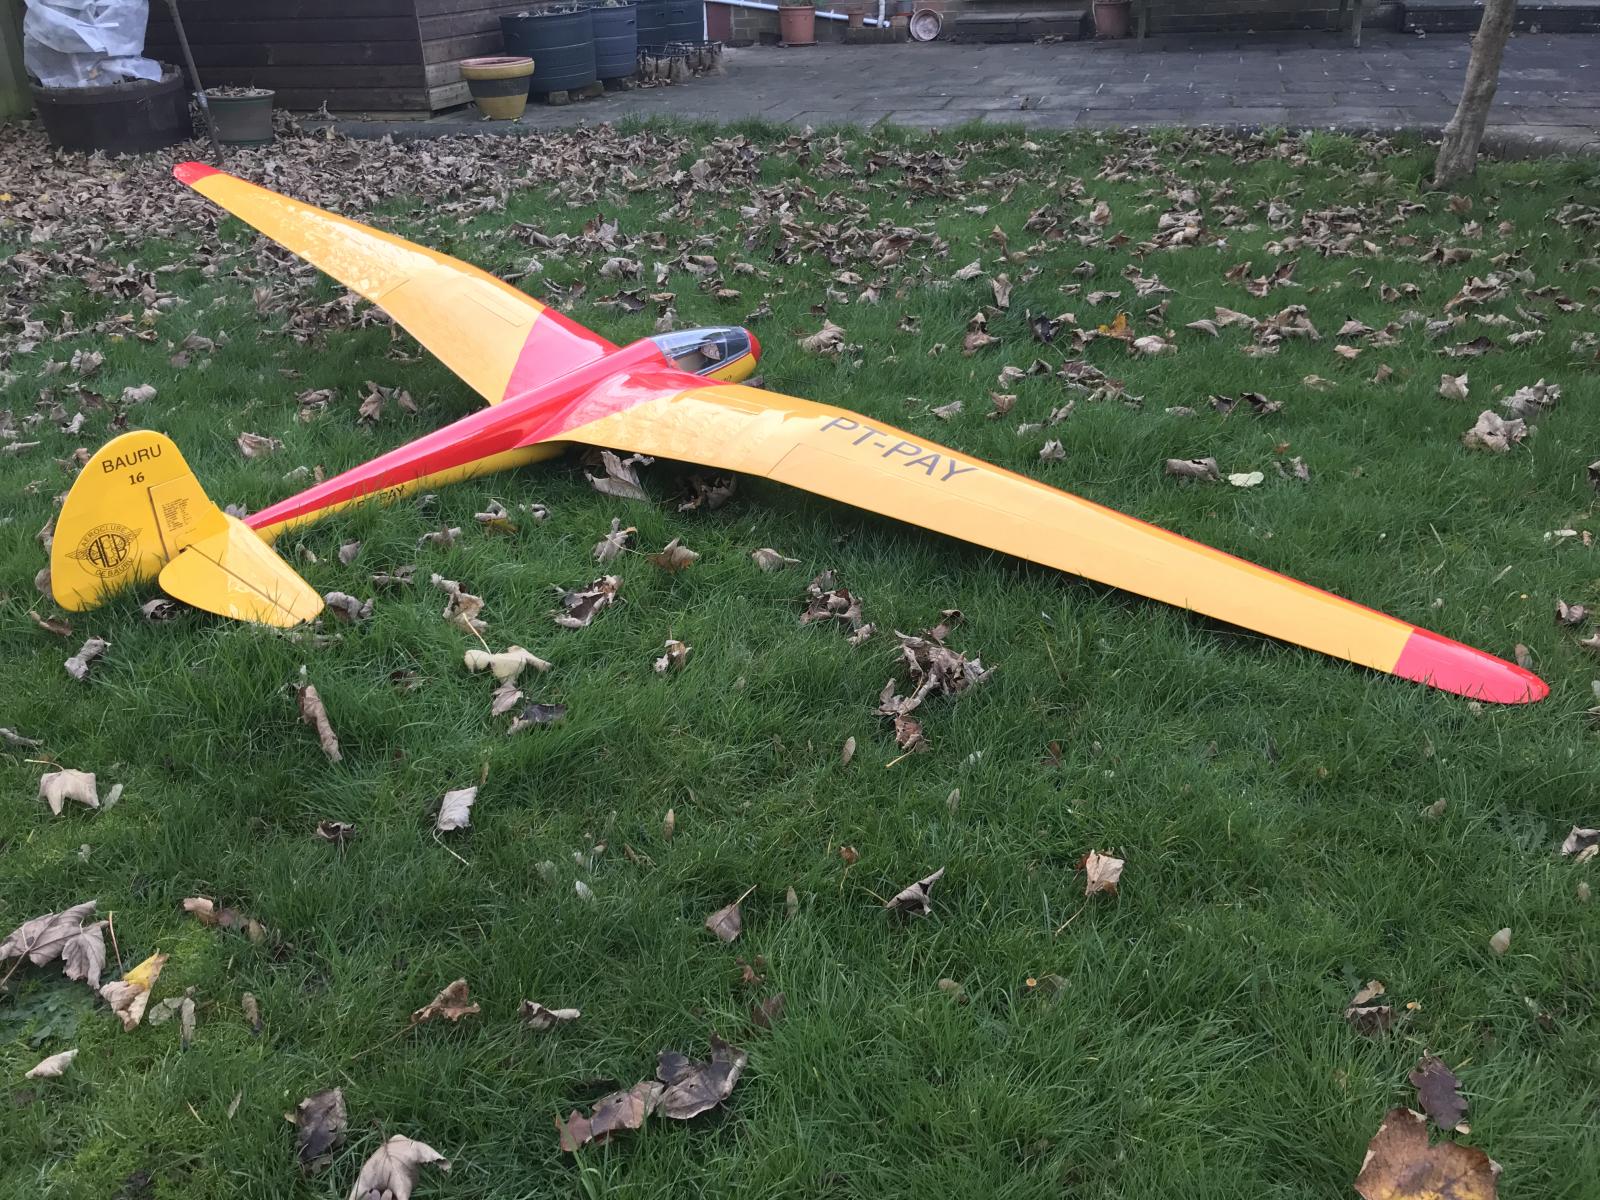 Robin's Flamingo HW-4